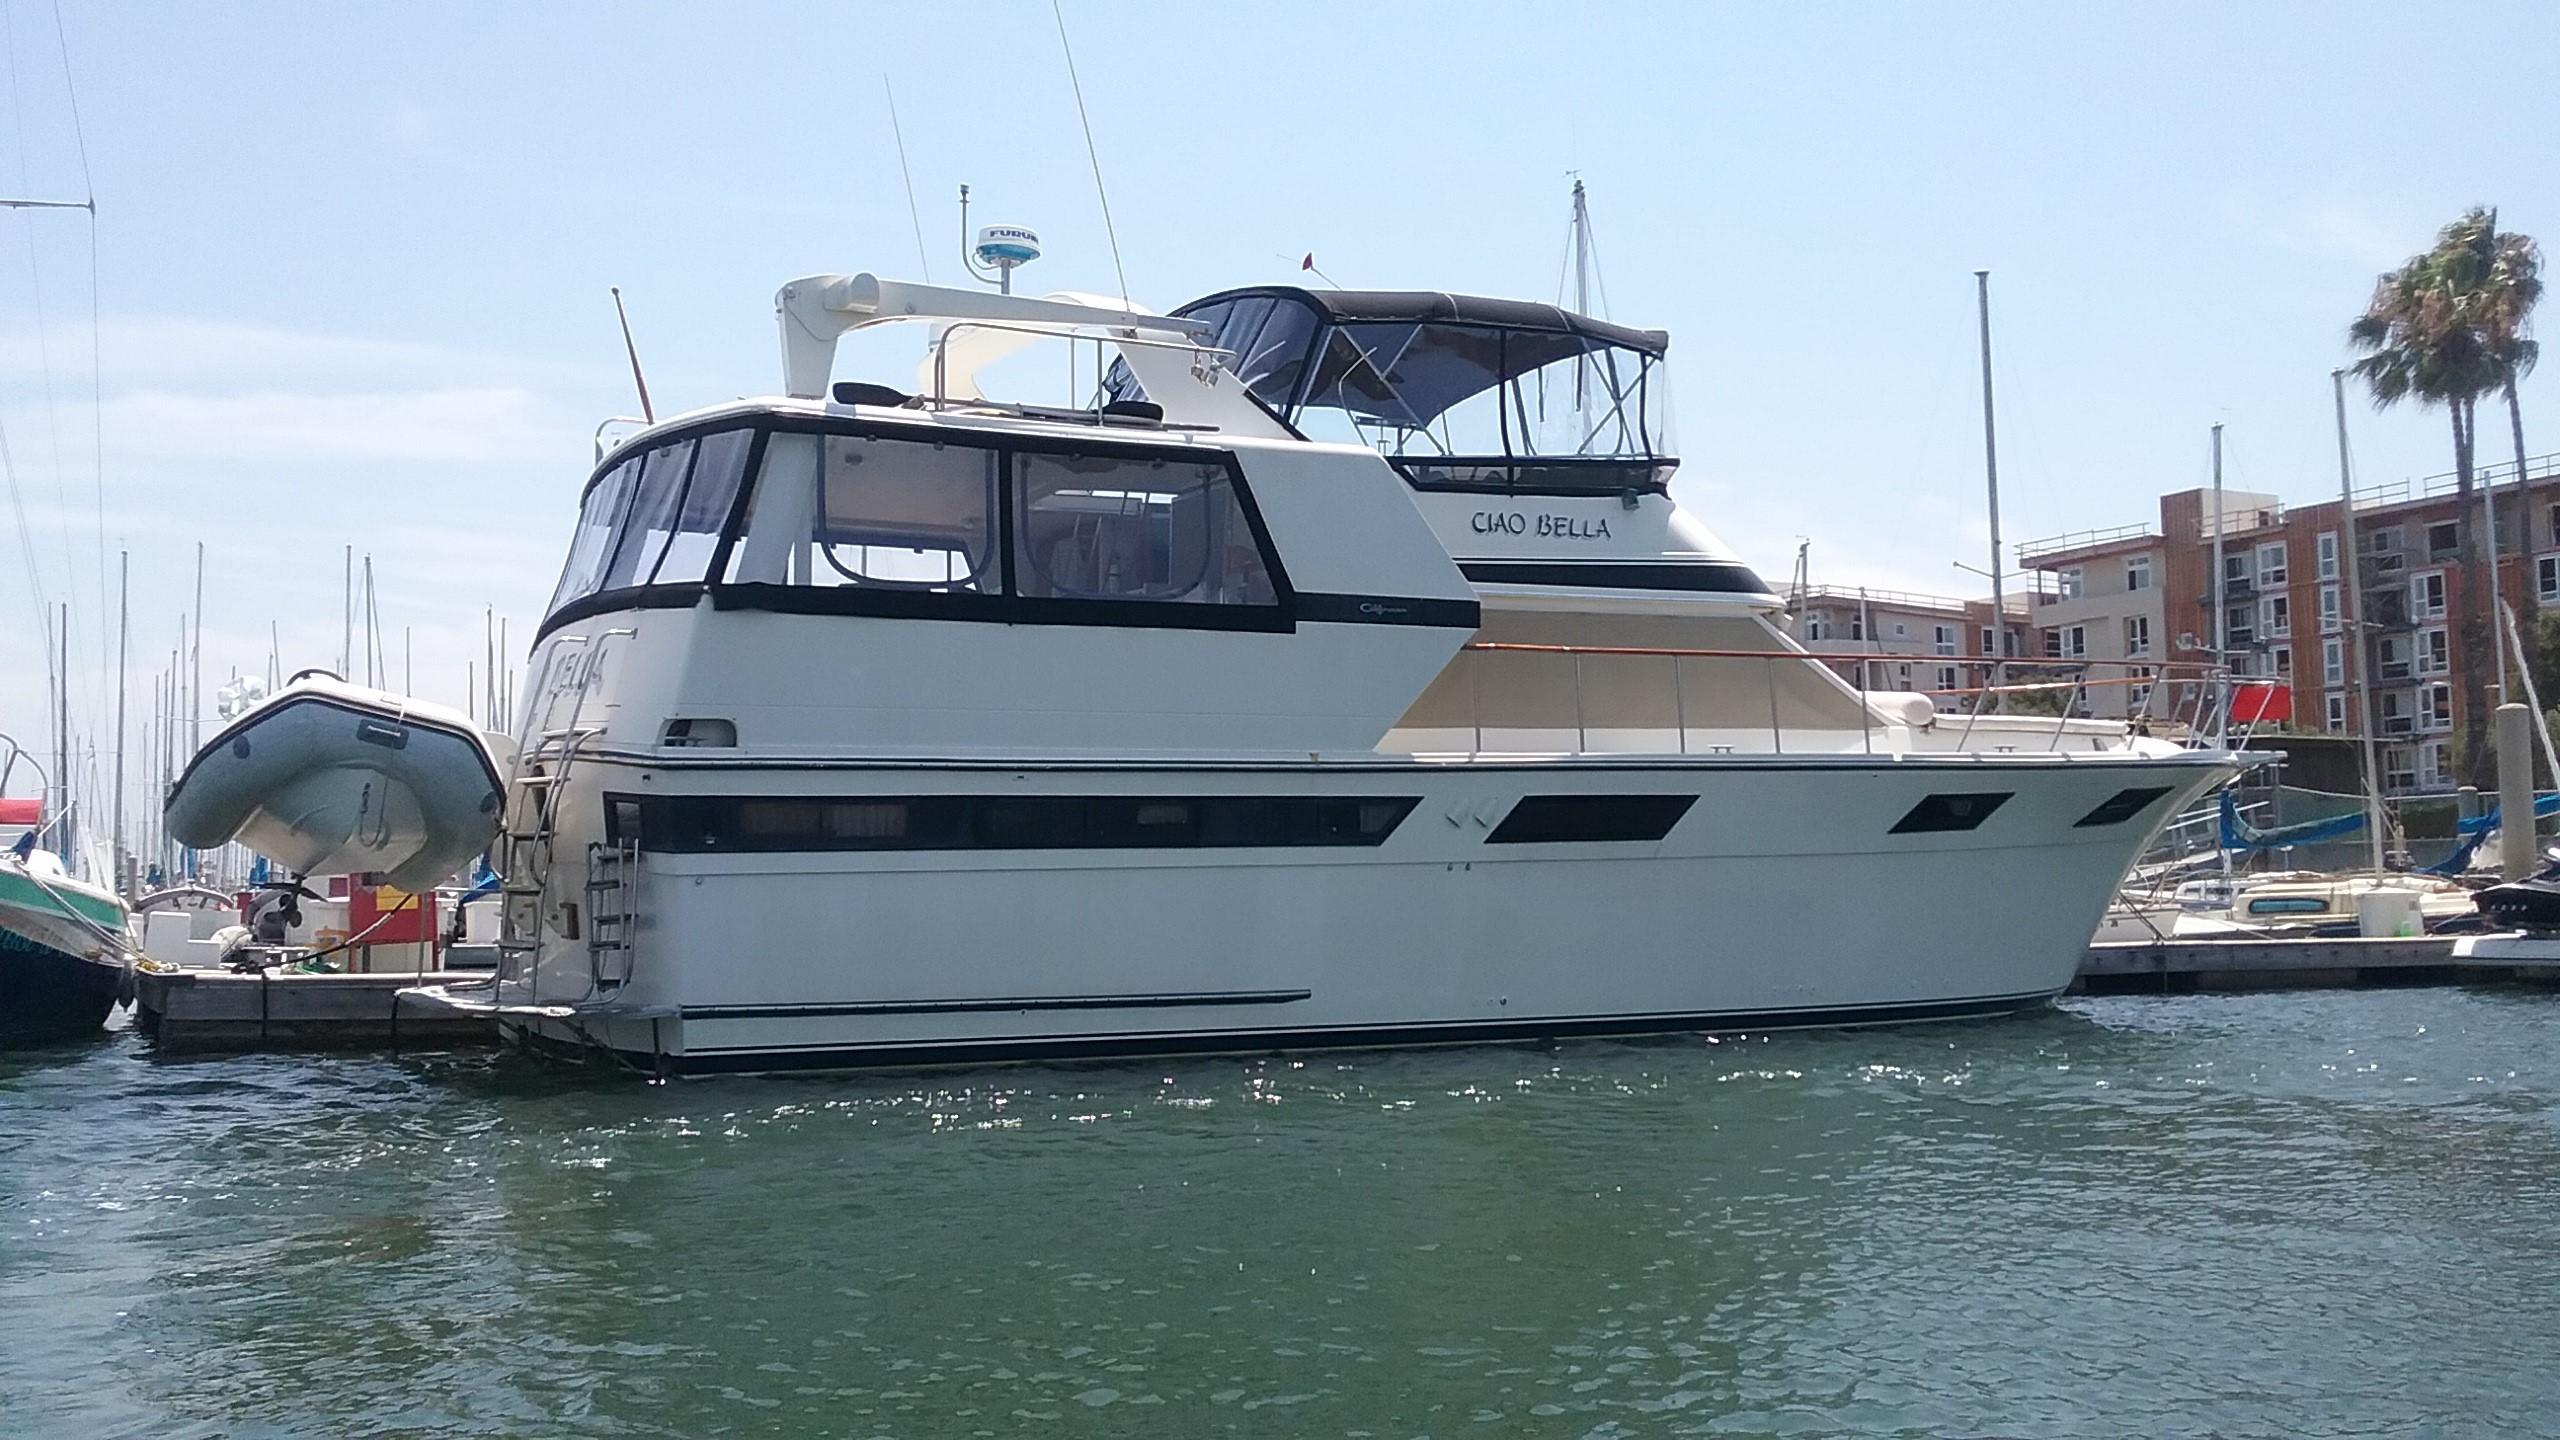 Luxury Yacht, Yachts for Sale, Brokerage, Fleming Yacht, Corvette